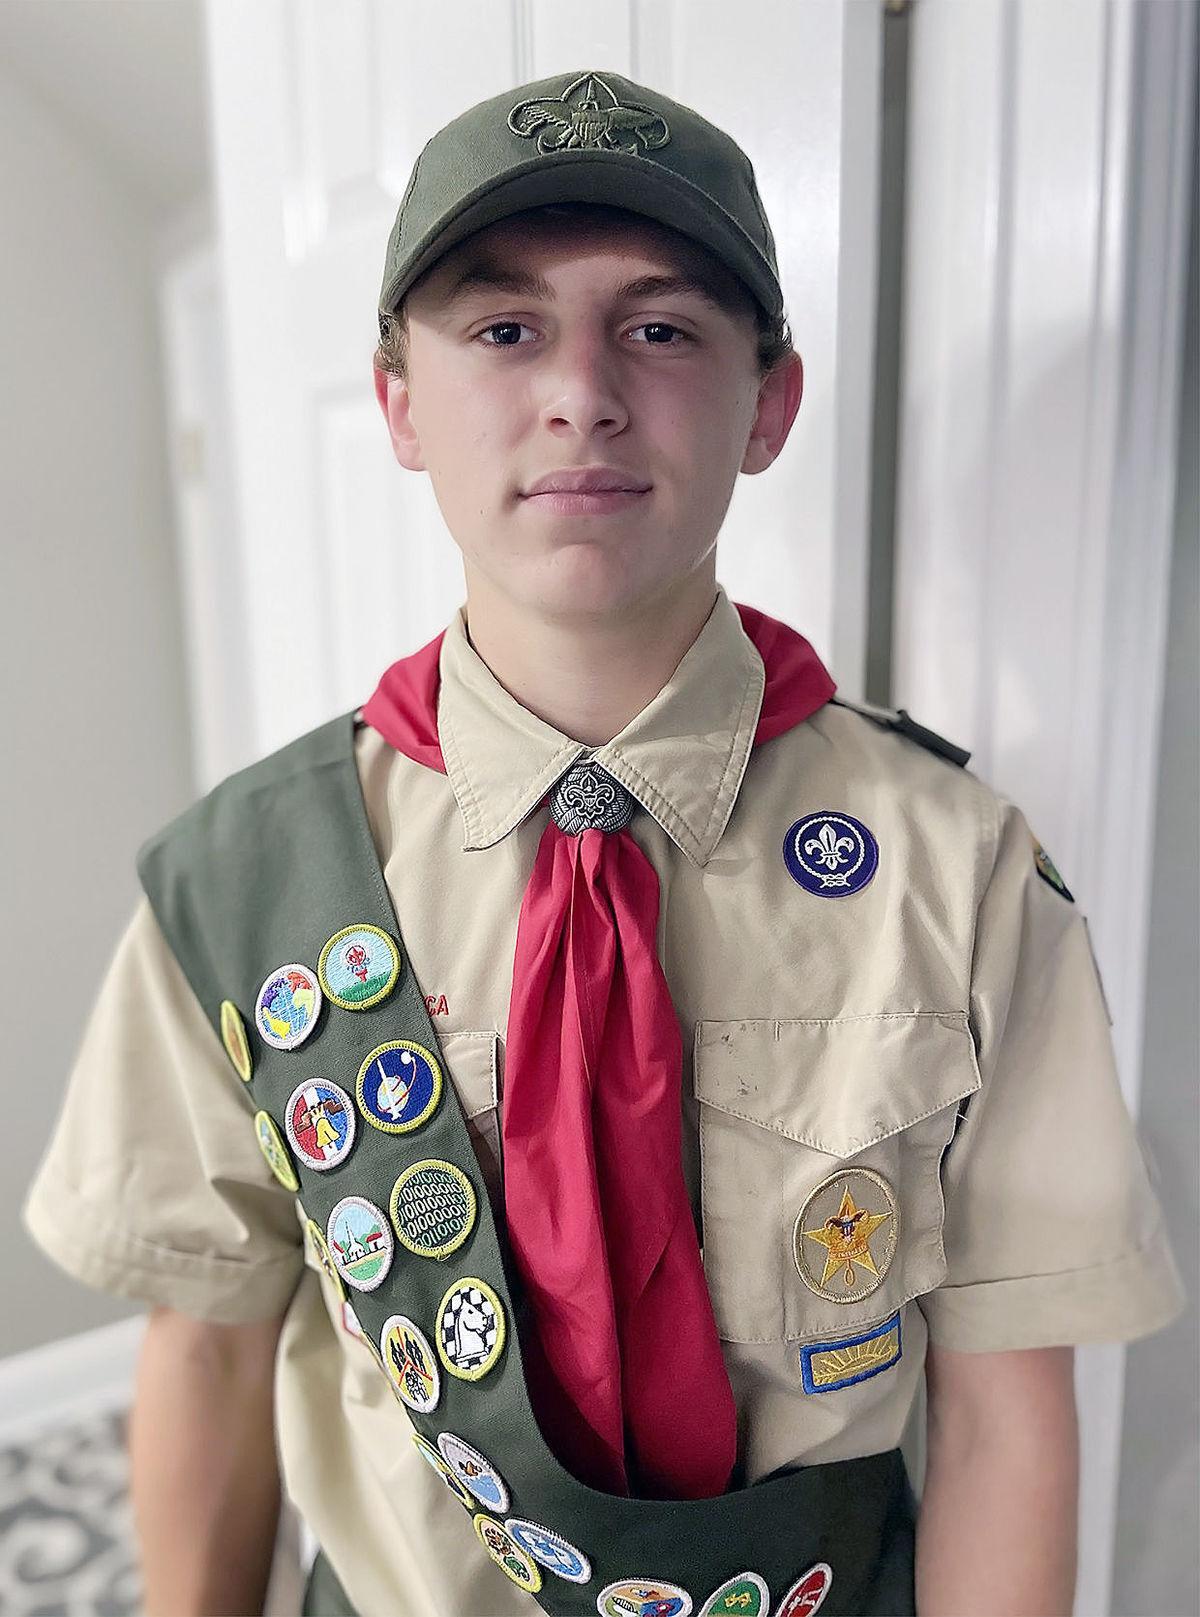 20210611-news-boy_scout_1.jpg